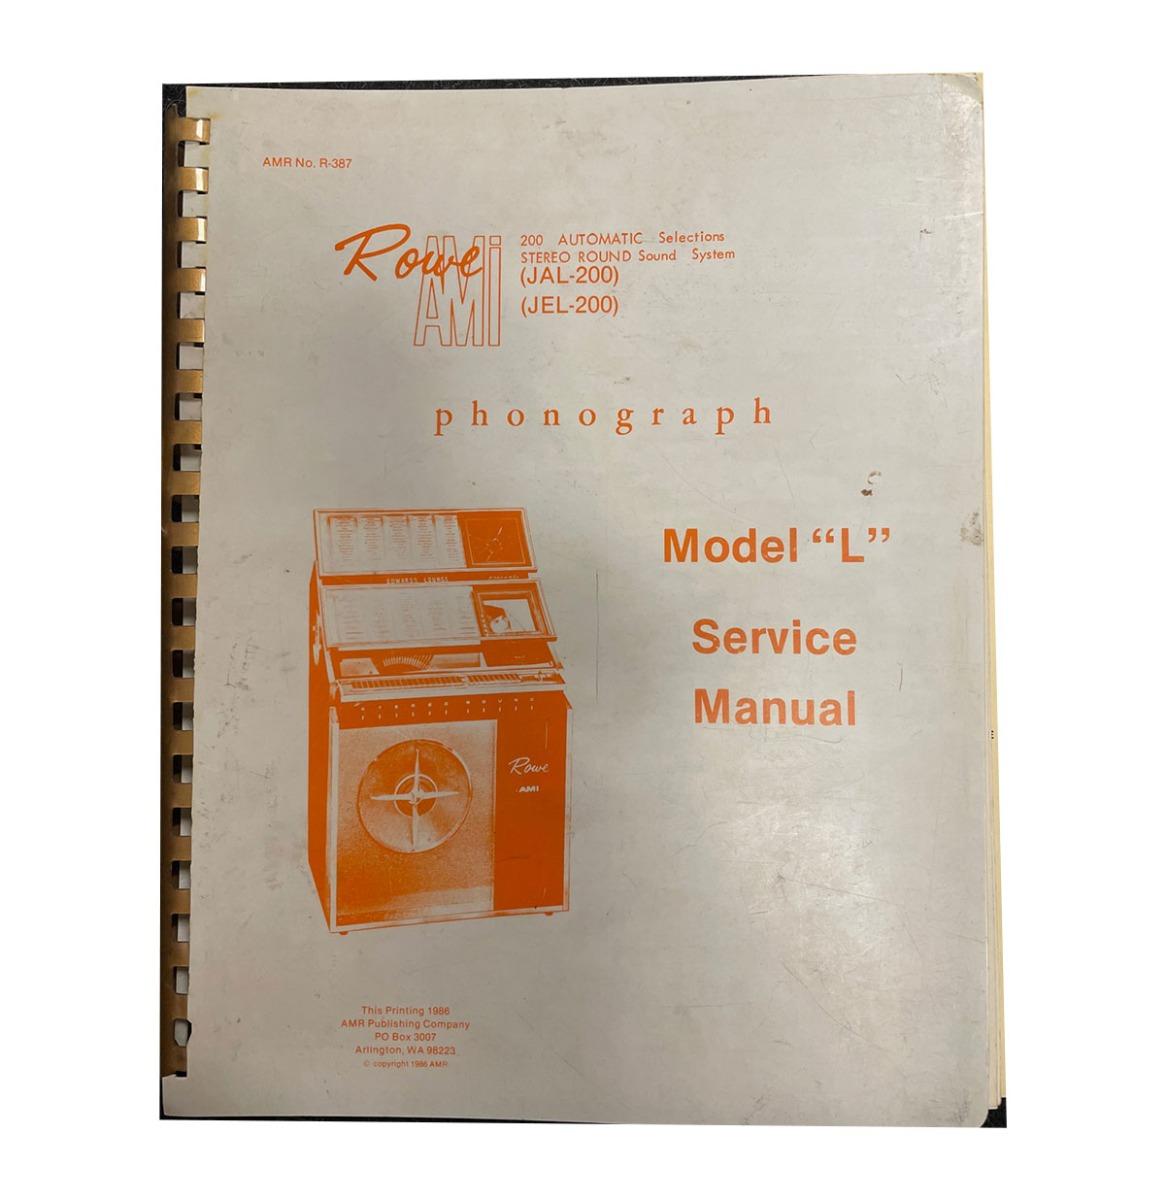 Ami model L - Service Manual Pre-owned